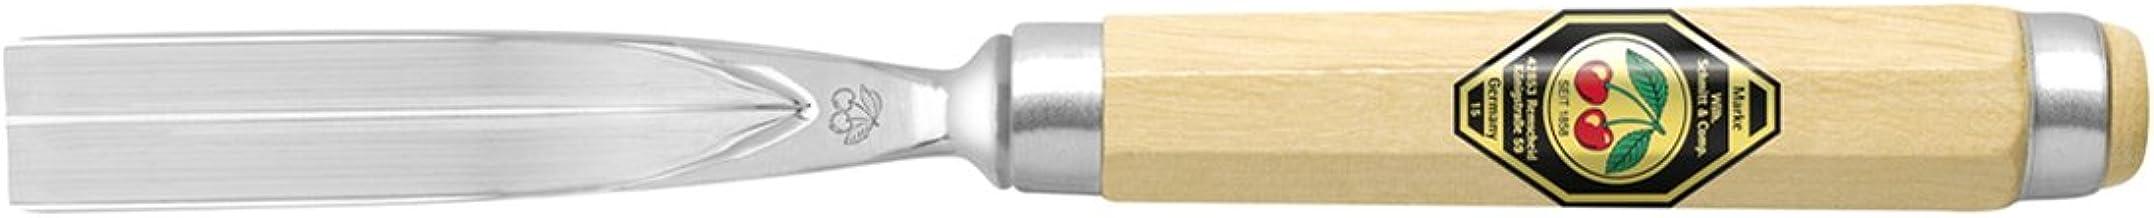 Gubia Kirschen color blanco punta 3, curvo, 3 mm